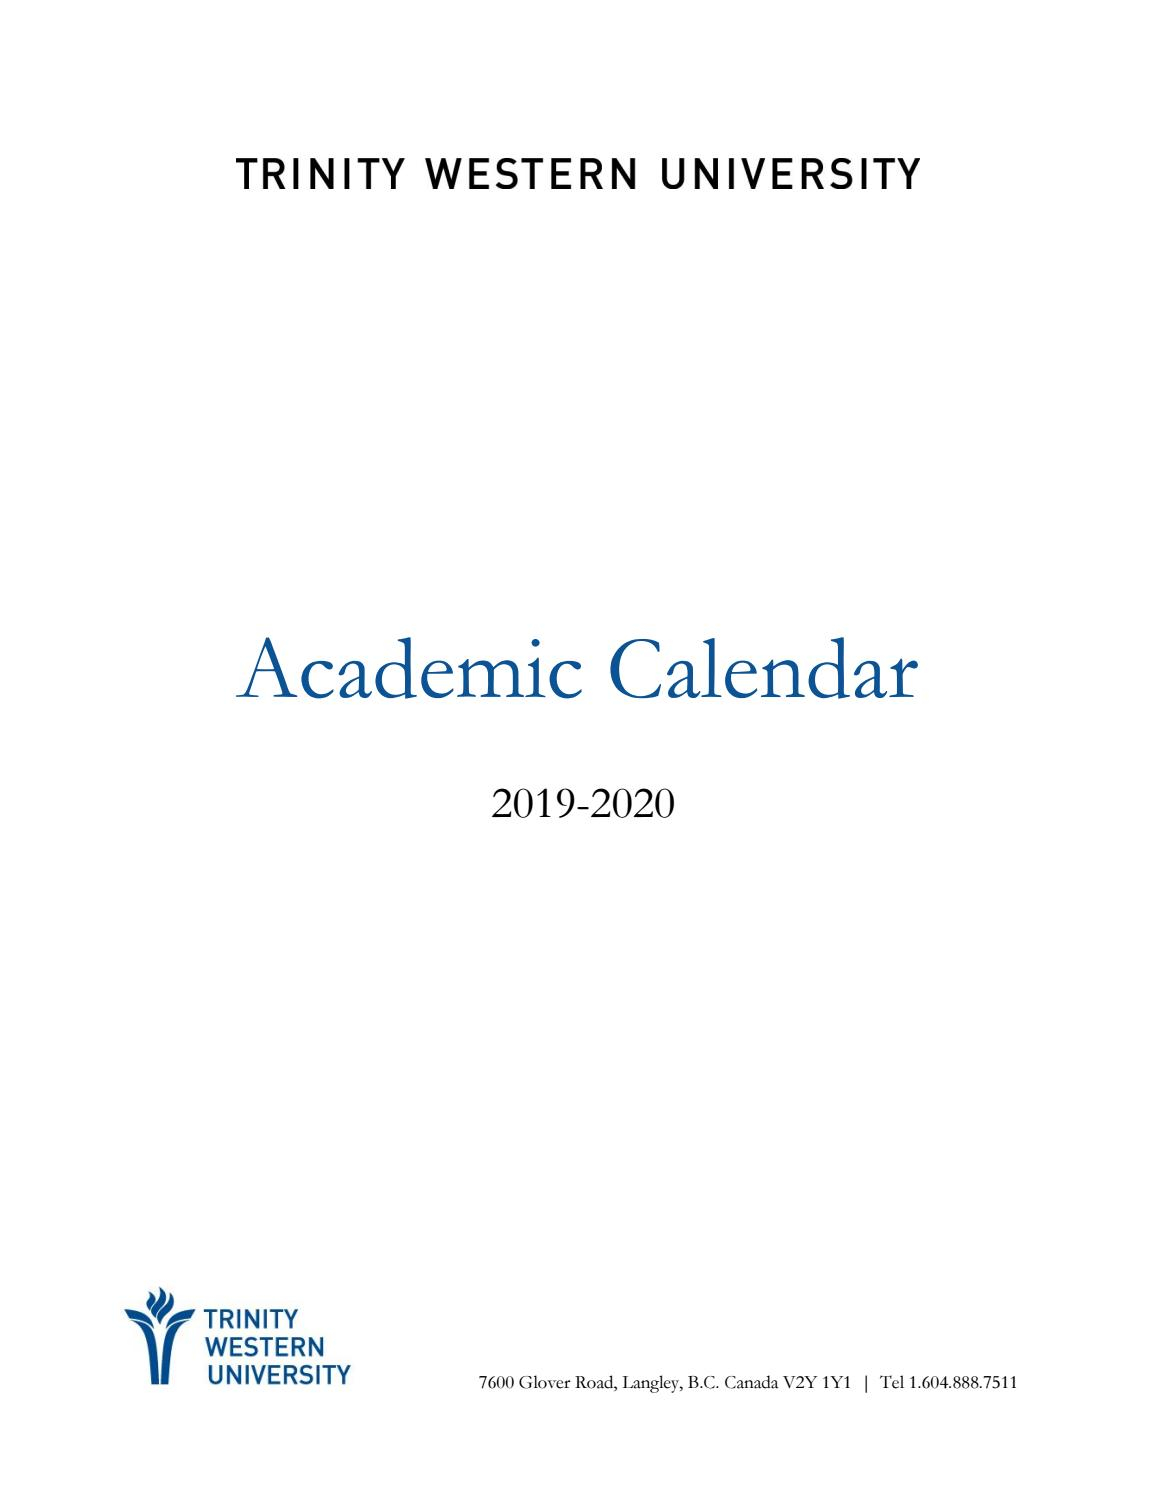 2019 20 Academic Calendartwu – Issuu Regarding University Of South Florida Academic Calendar Downloadable